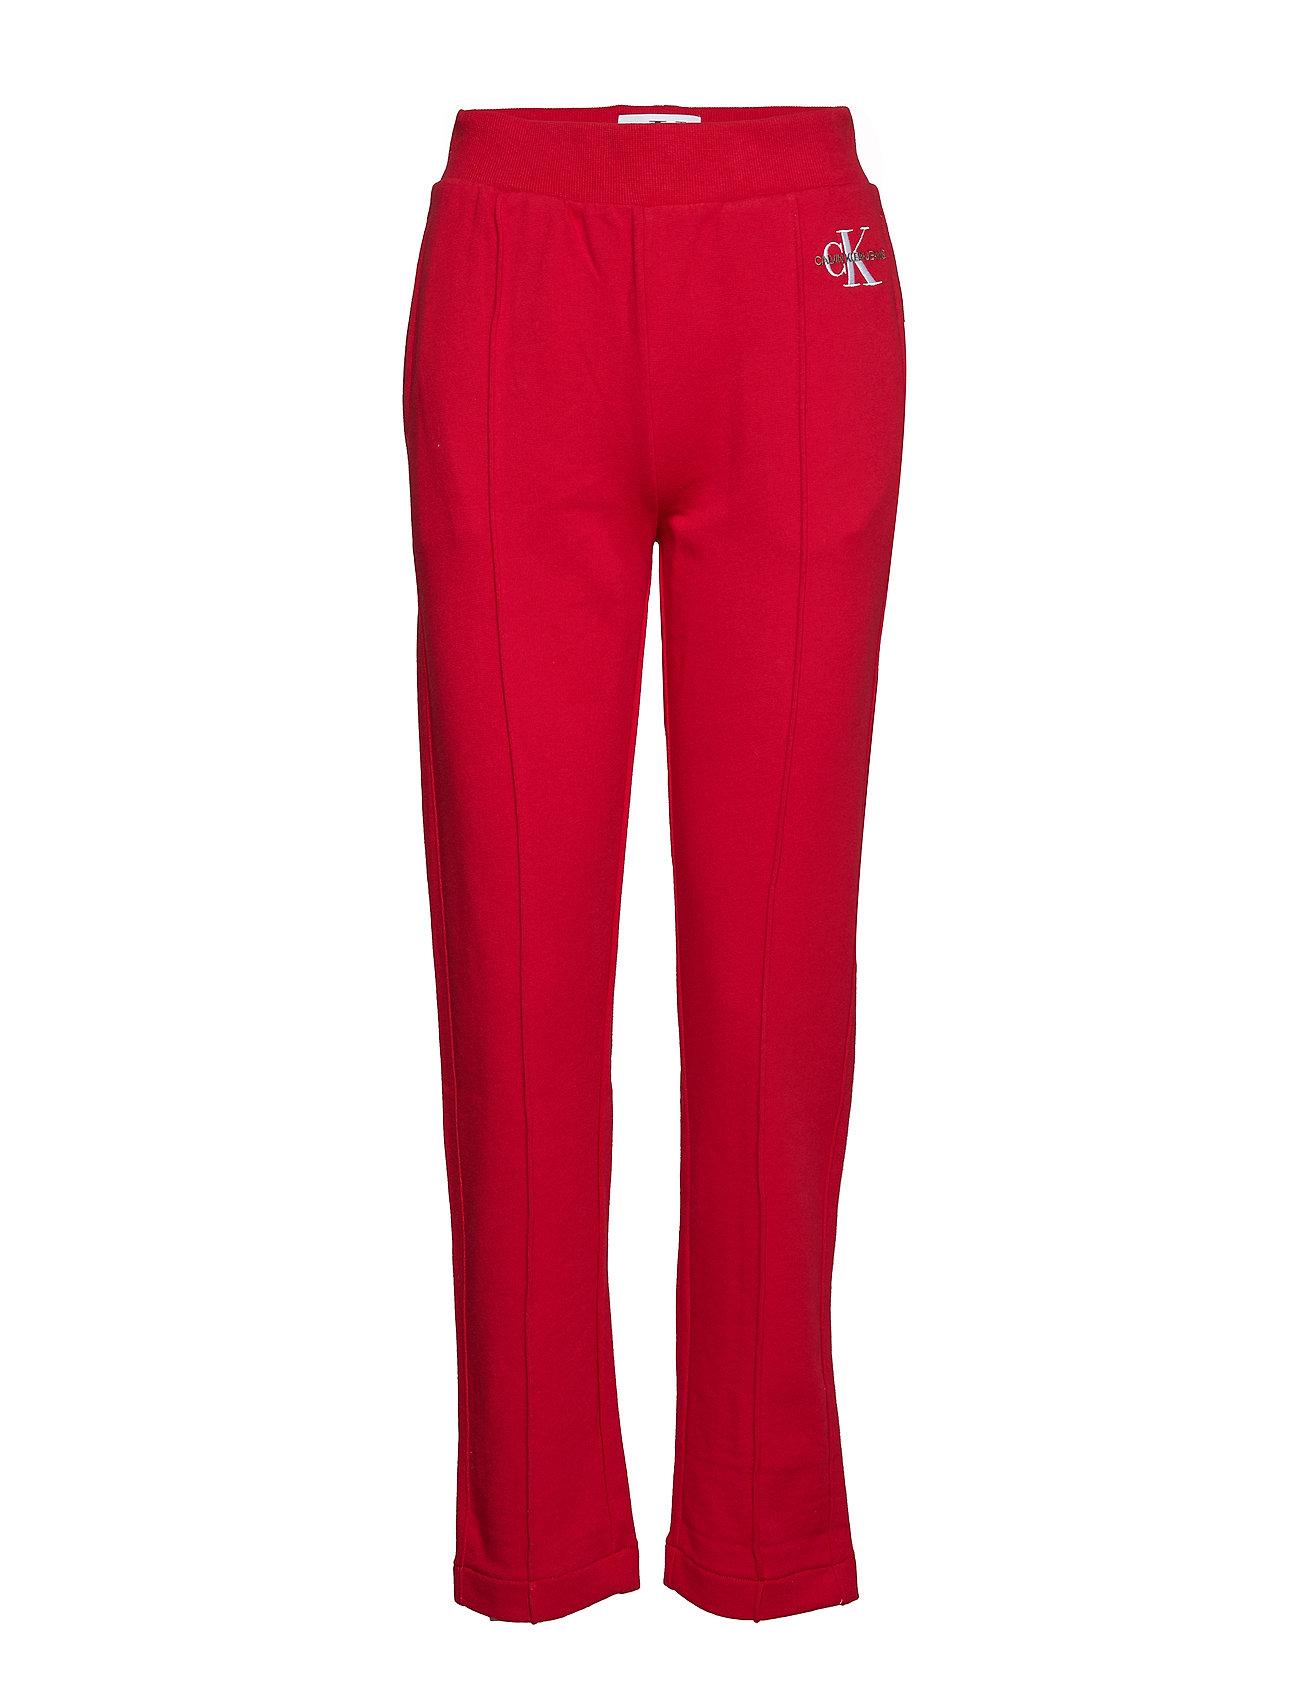 Calvin Klein Jeans MONOGRAM EMBROIDERY, - BARBADOS CHERRY